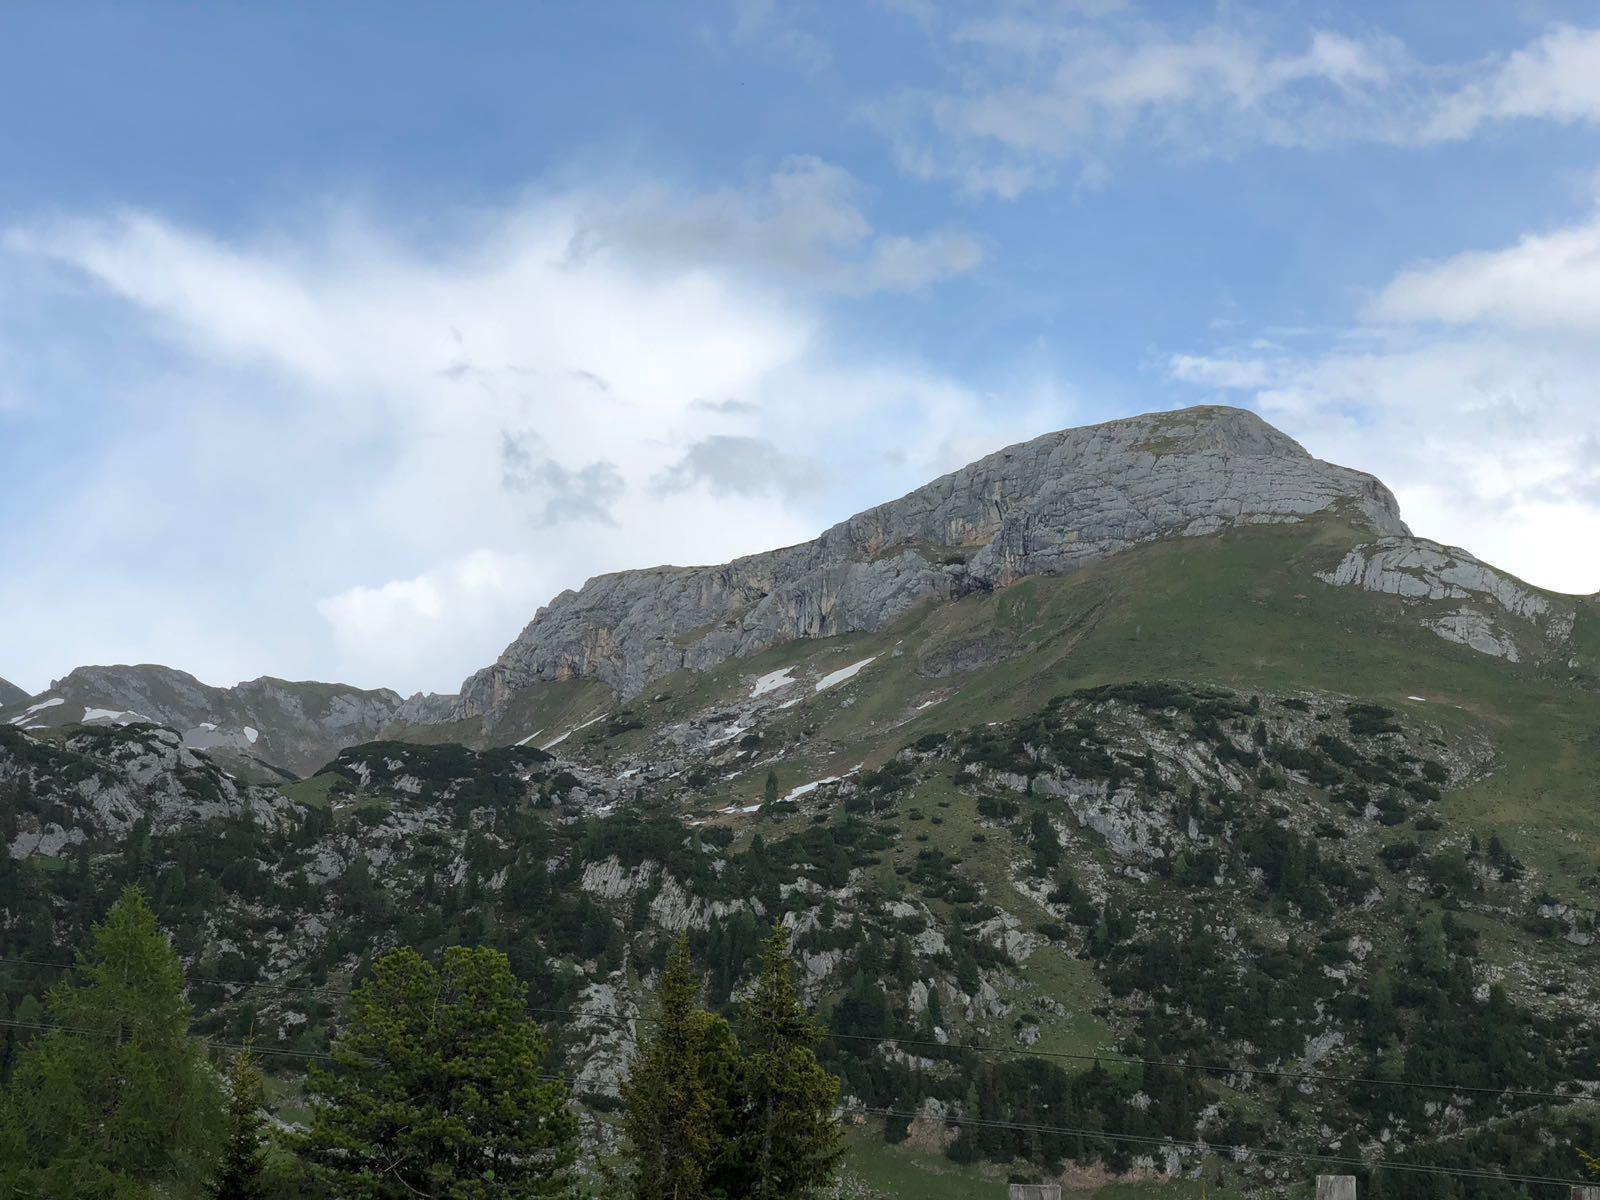 Haidachstellwand beim 5-Gipfel-Klettersteig im Rofan | Climbers Paradise